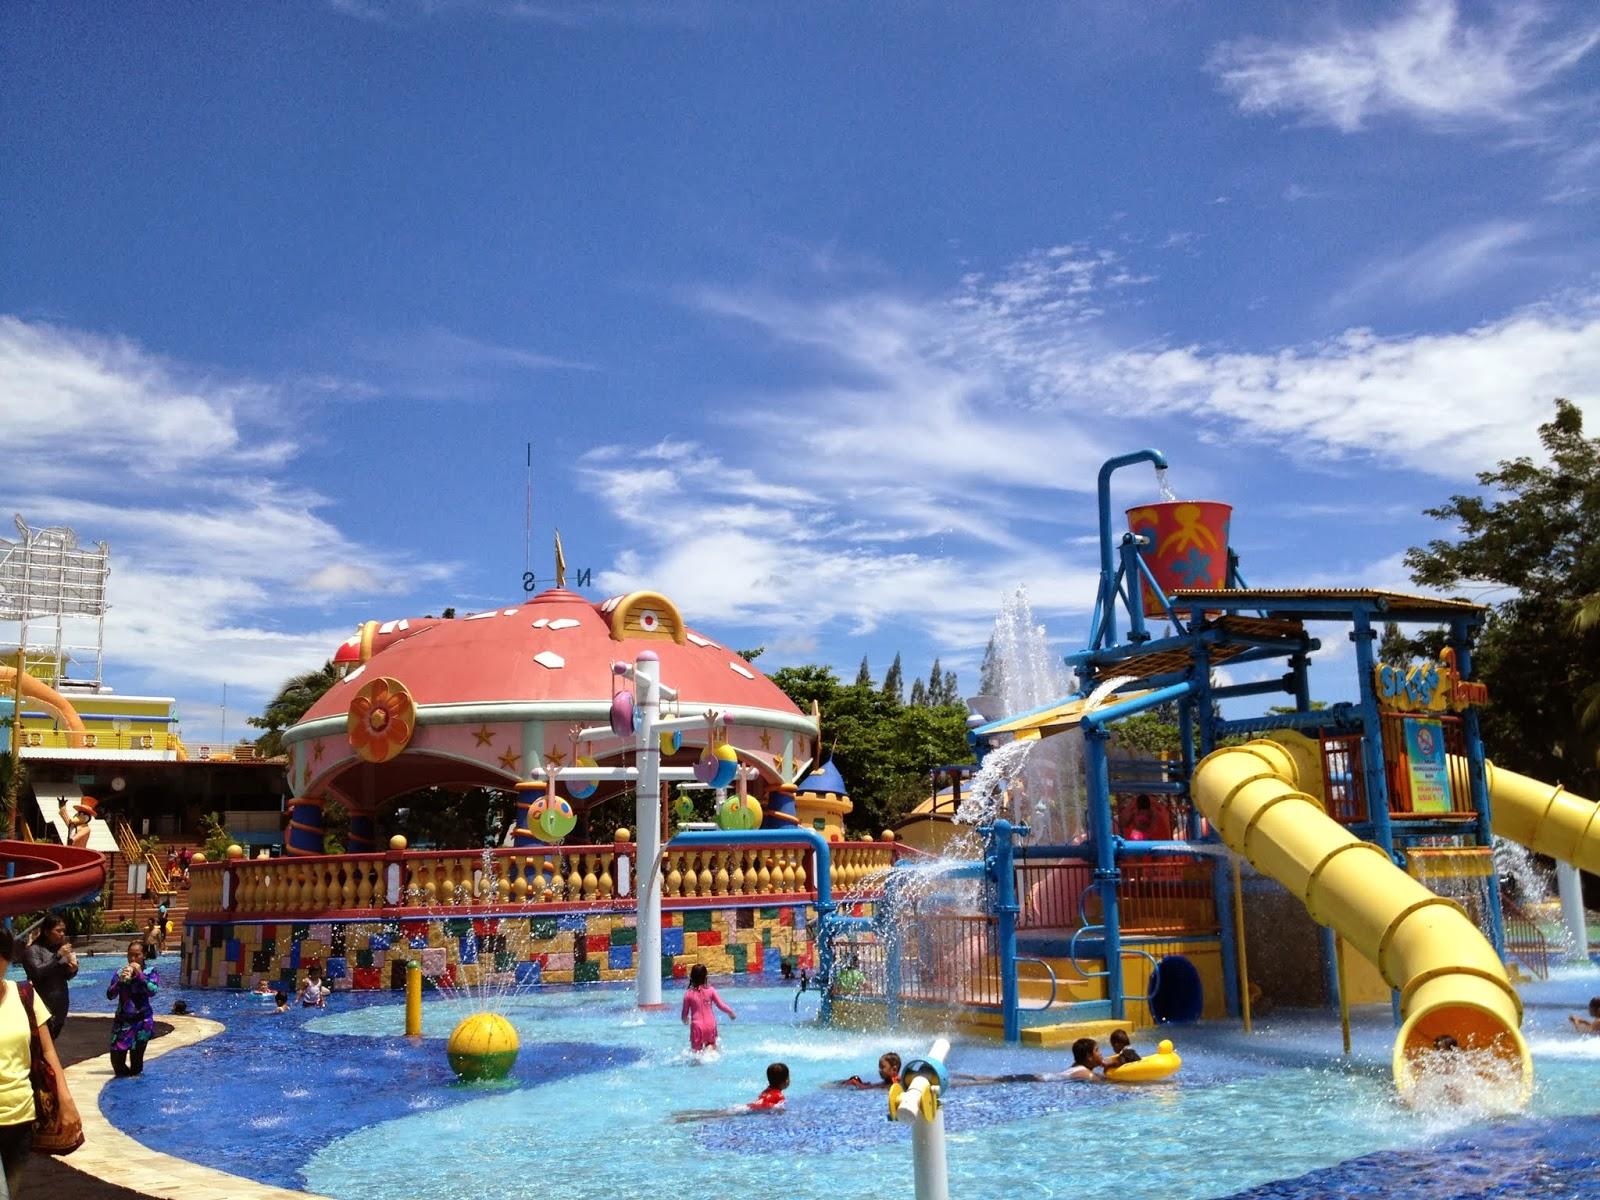 Snap Harga Tiket Masuk Ocean Park Bsd 2014 Newhairstylesformen2014 Newhairstylesformen2014com